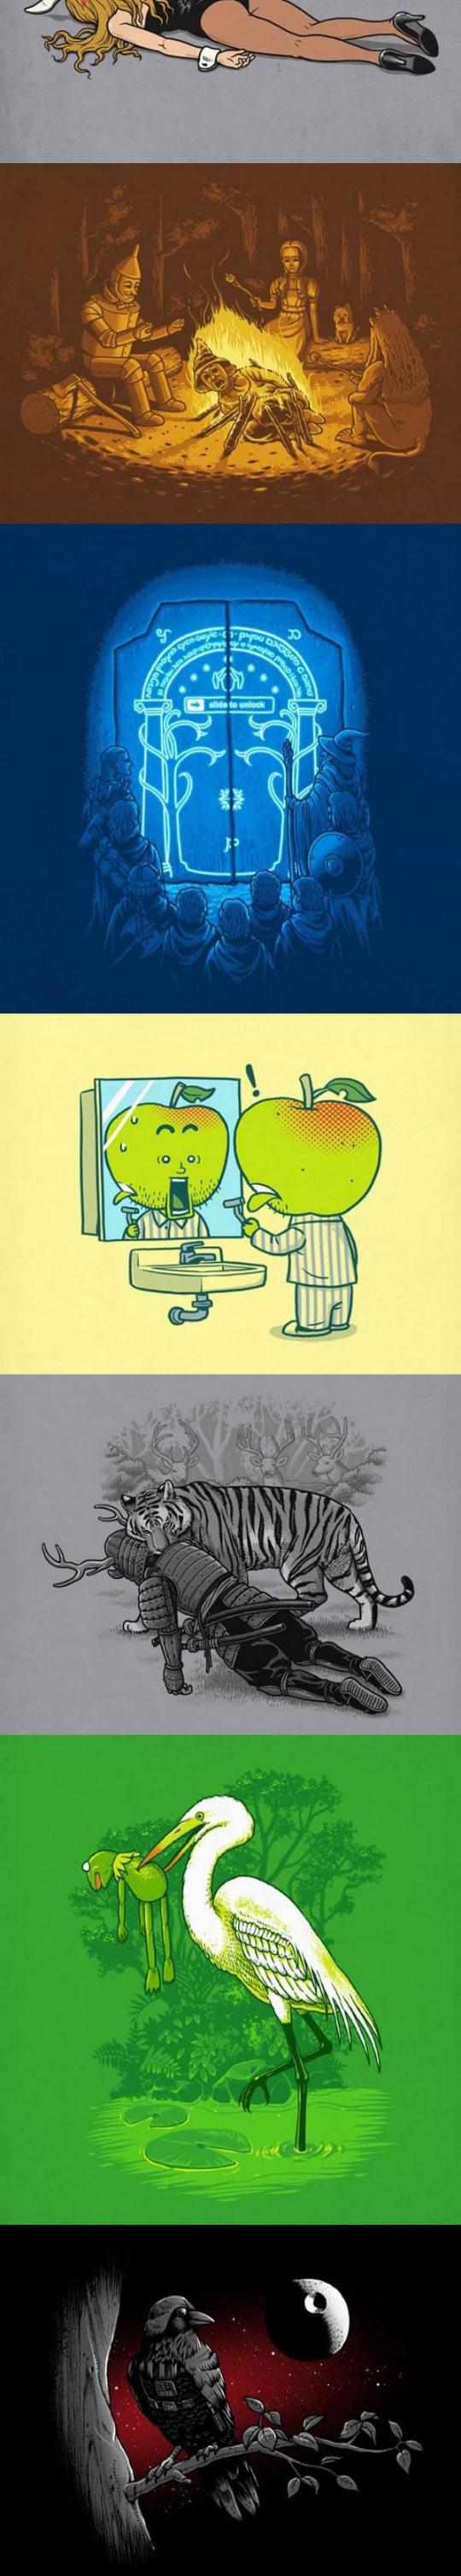 funny-illustrations-Pinocchio-Star-Wars-crow